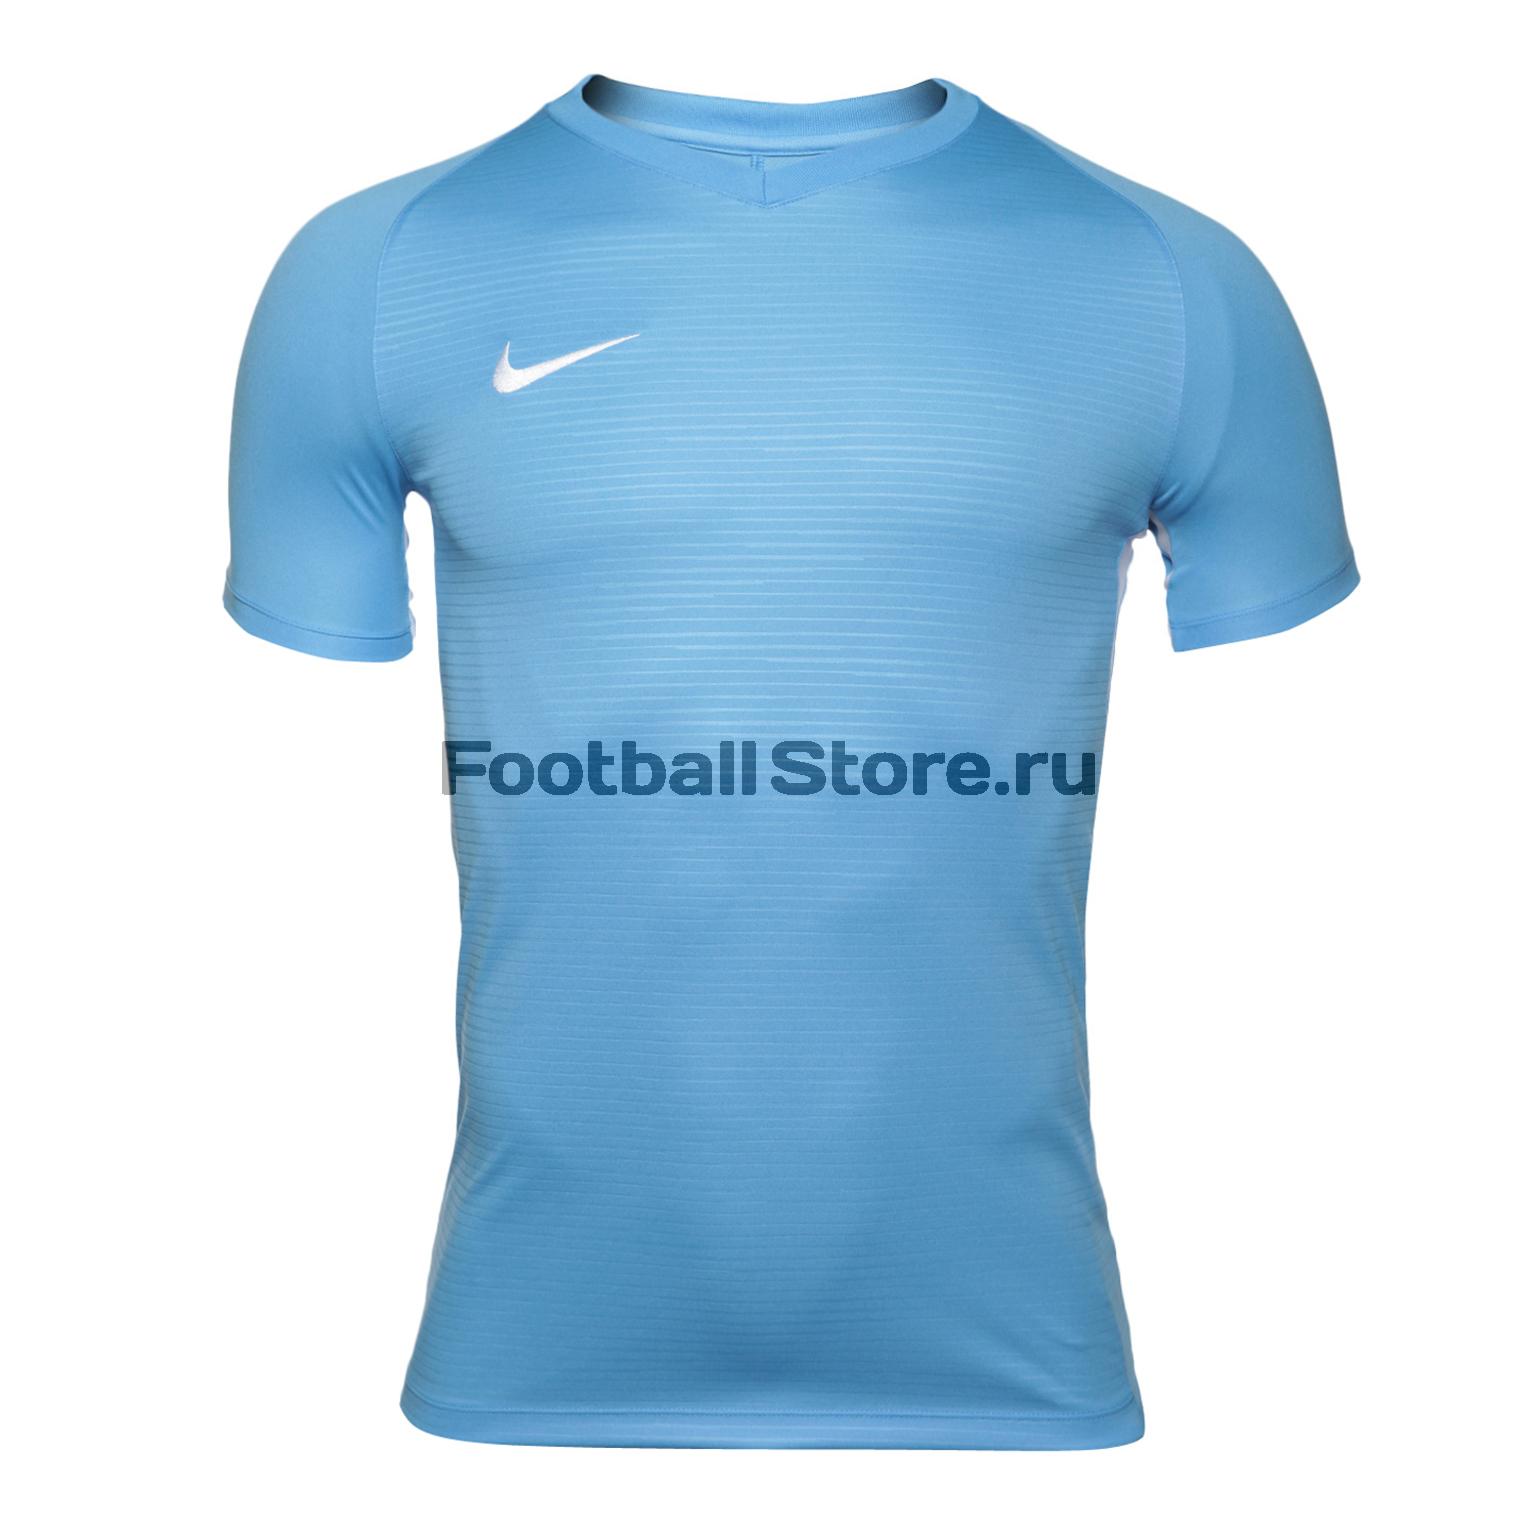 Футболка игровая Nike Dry Tiempo Prem JSY SS 894230-412 nike футболка zenit ss h a stadium jsy